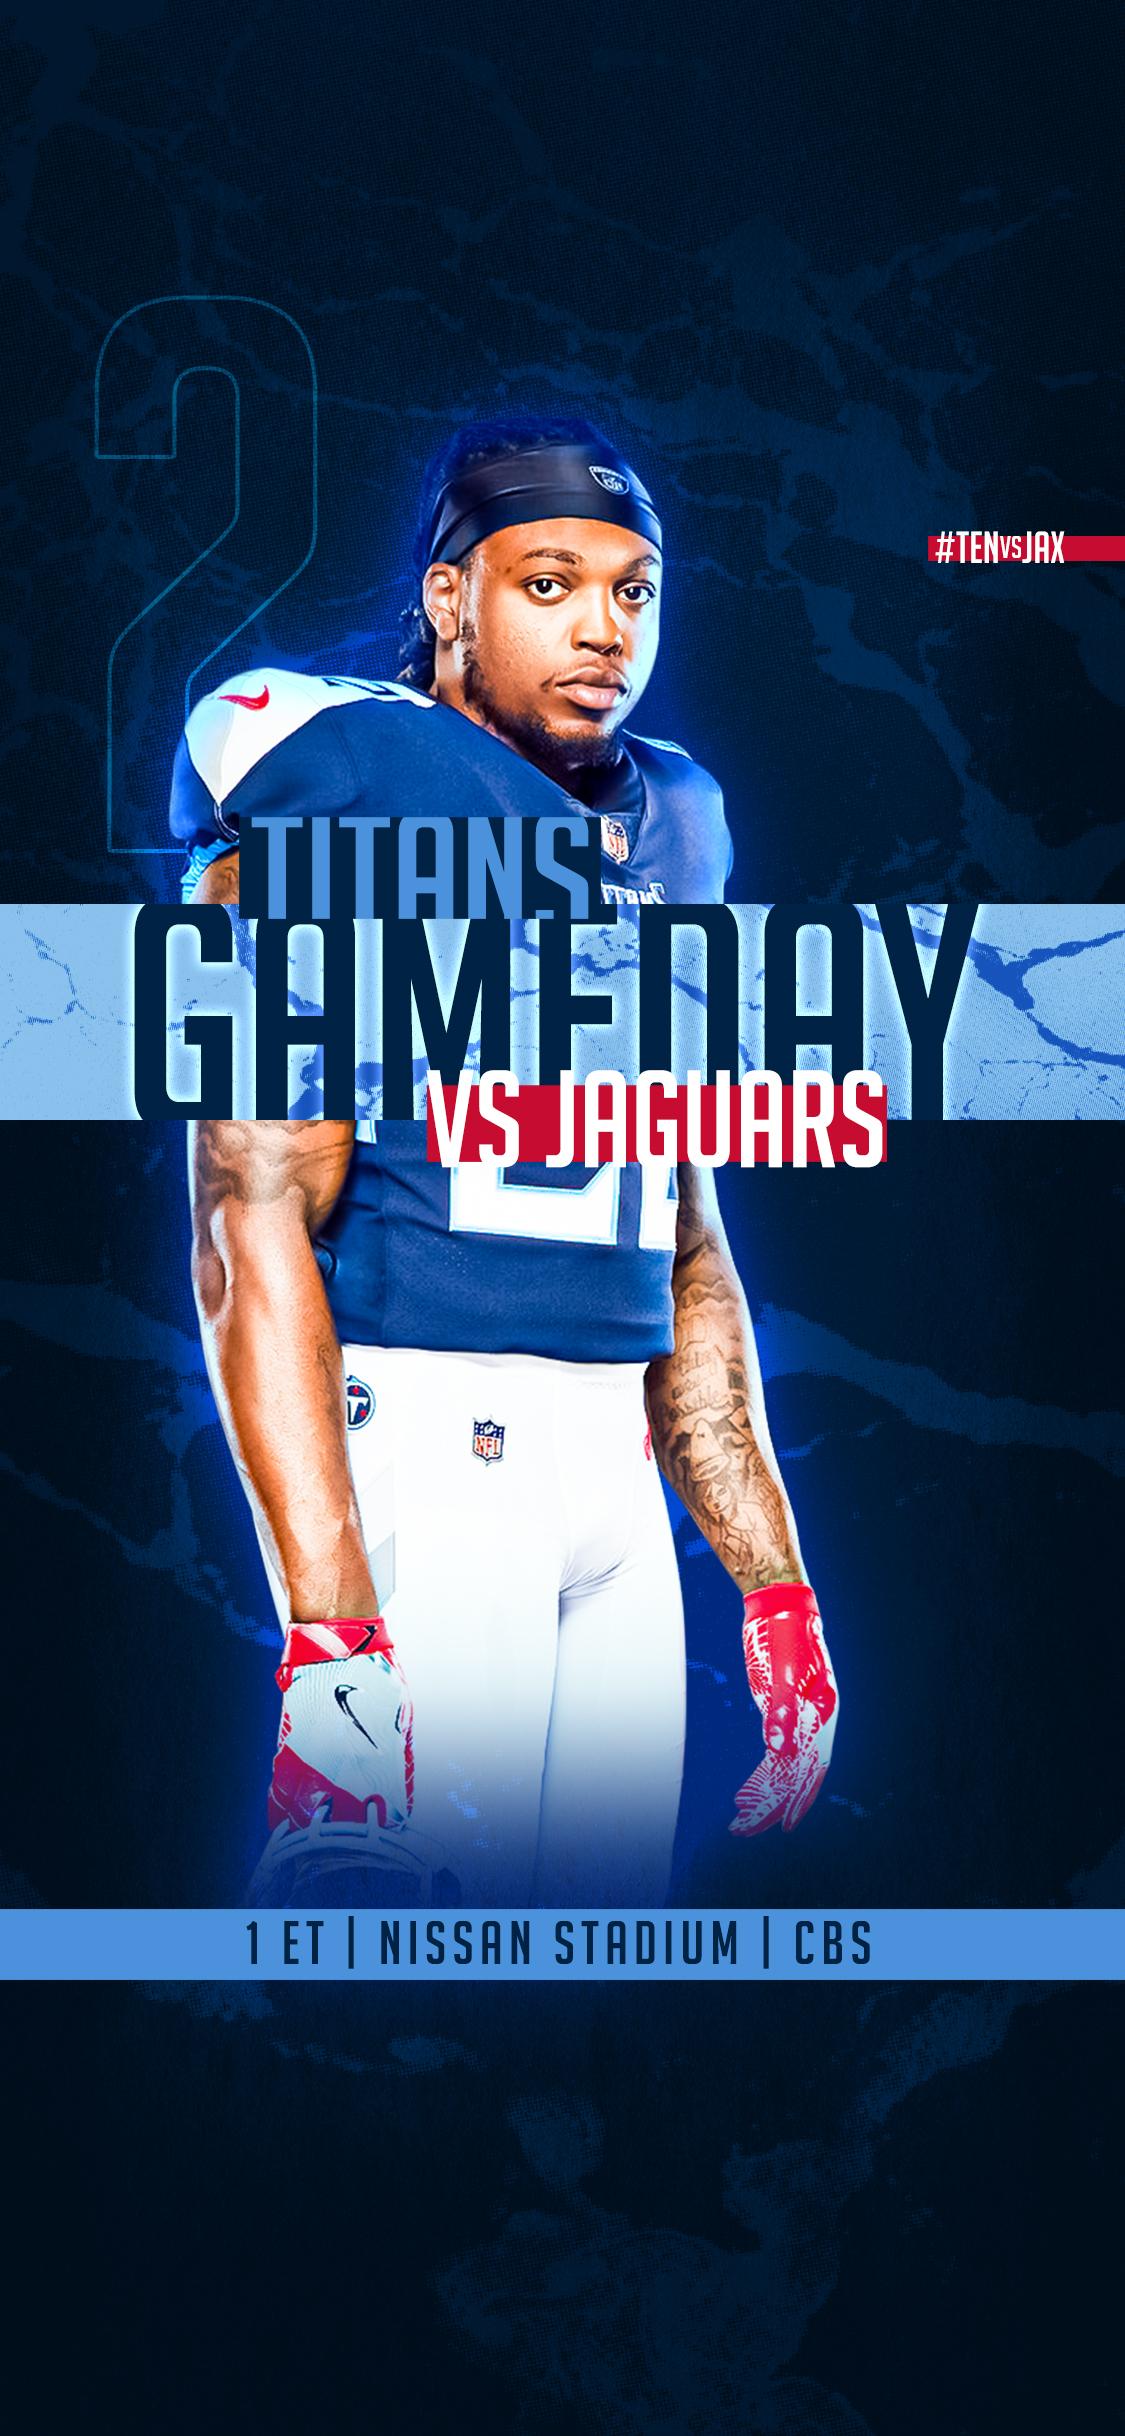 Titans-Gameday-IG Stories - 1125 x 2436